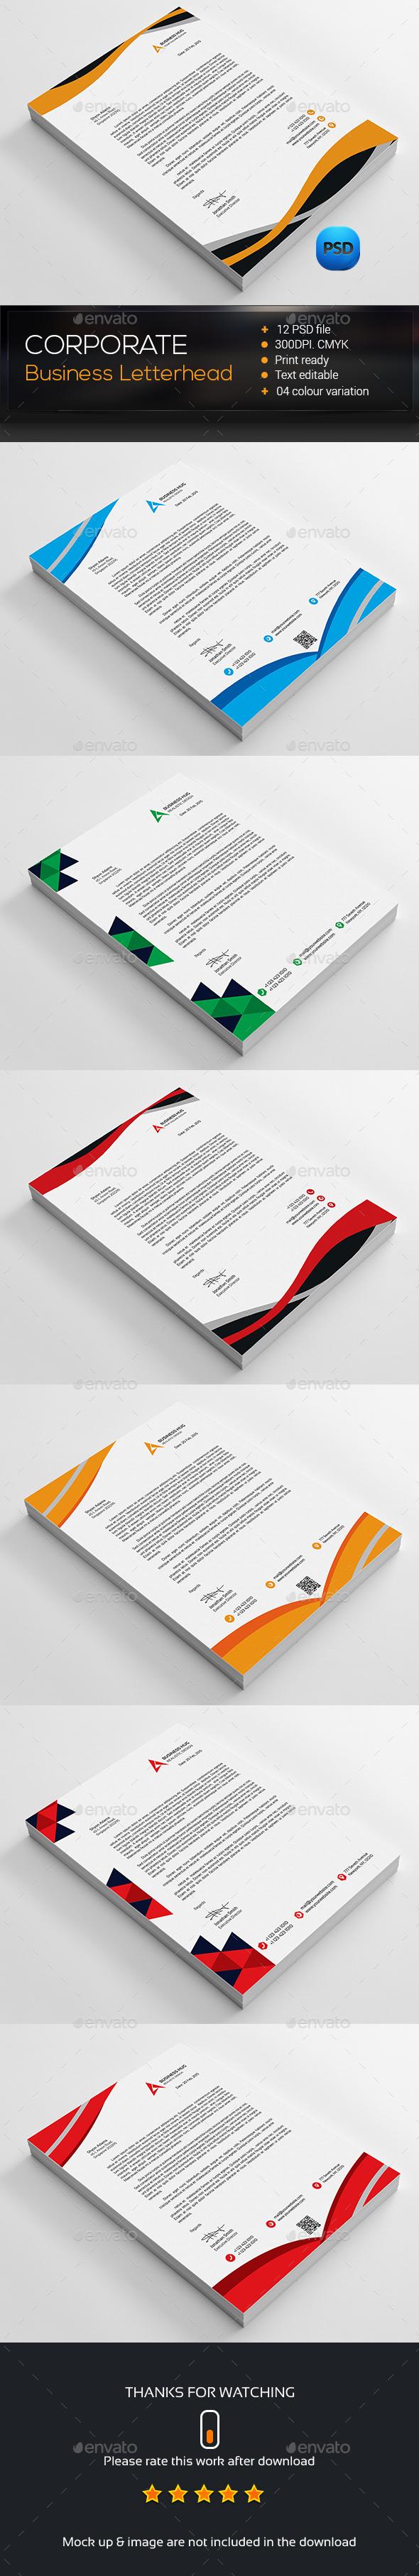 100 Business Letterheads Templates